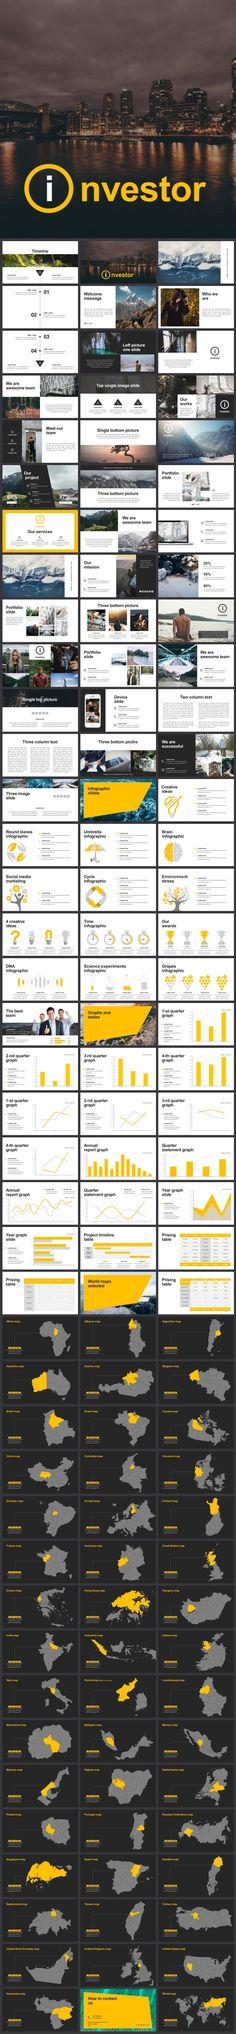 Investor - Keynote Template